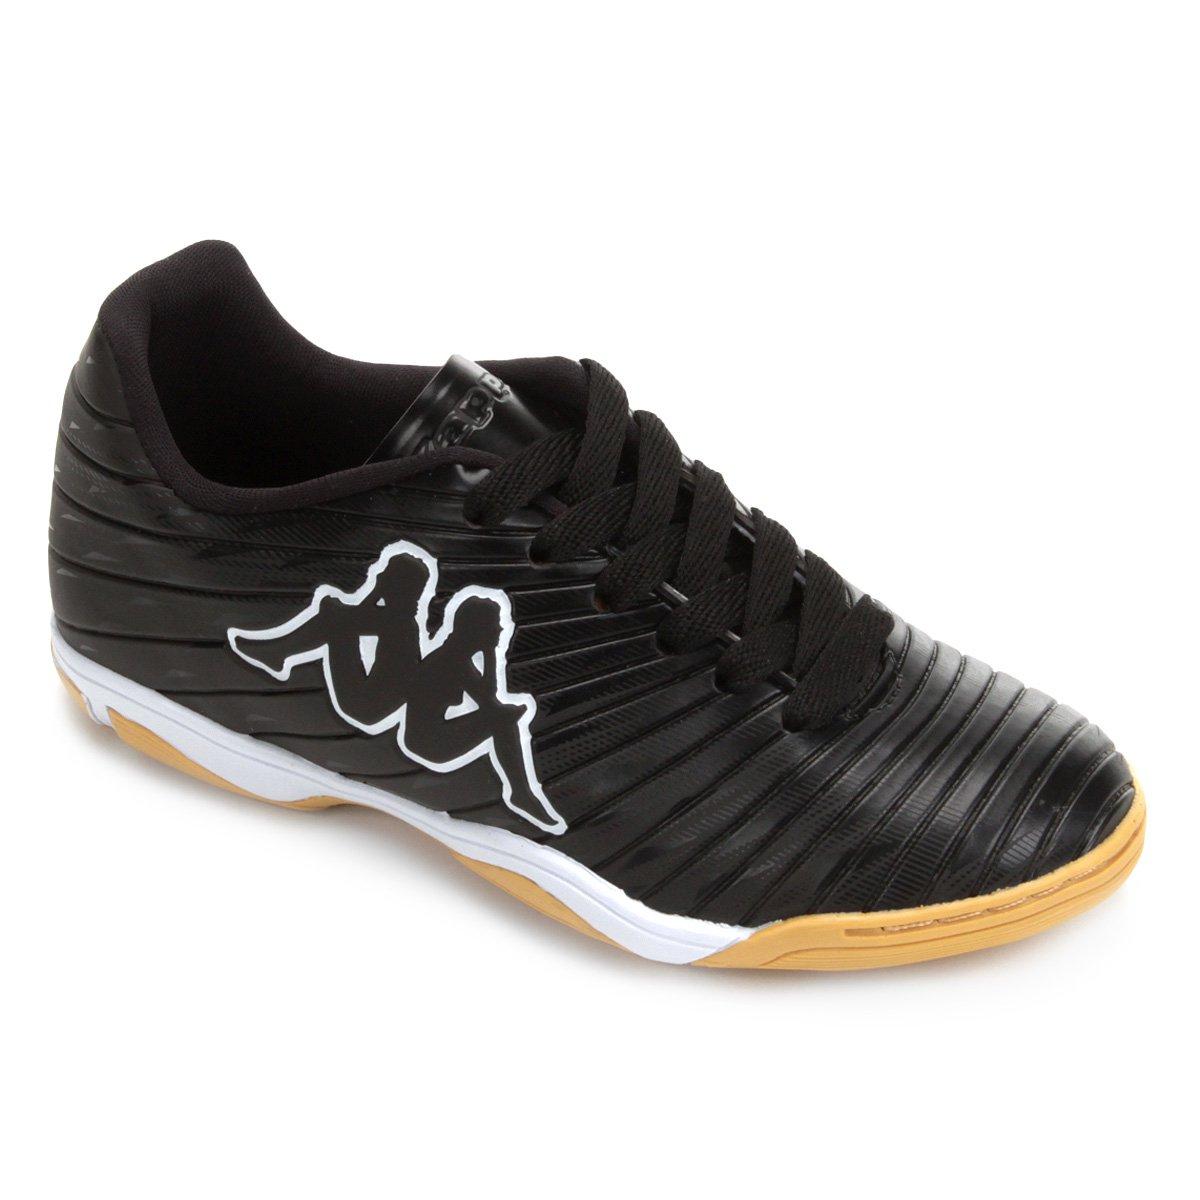 fcec6a93a0 Chuteira Futsal Infantil Kappa Thunder